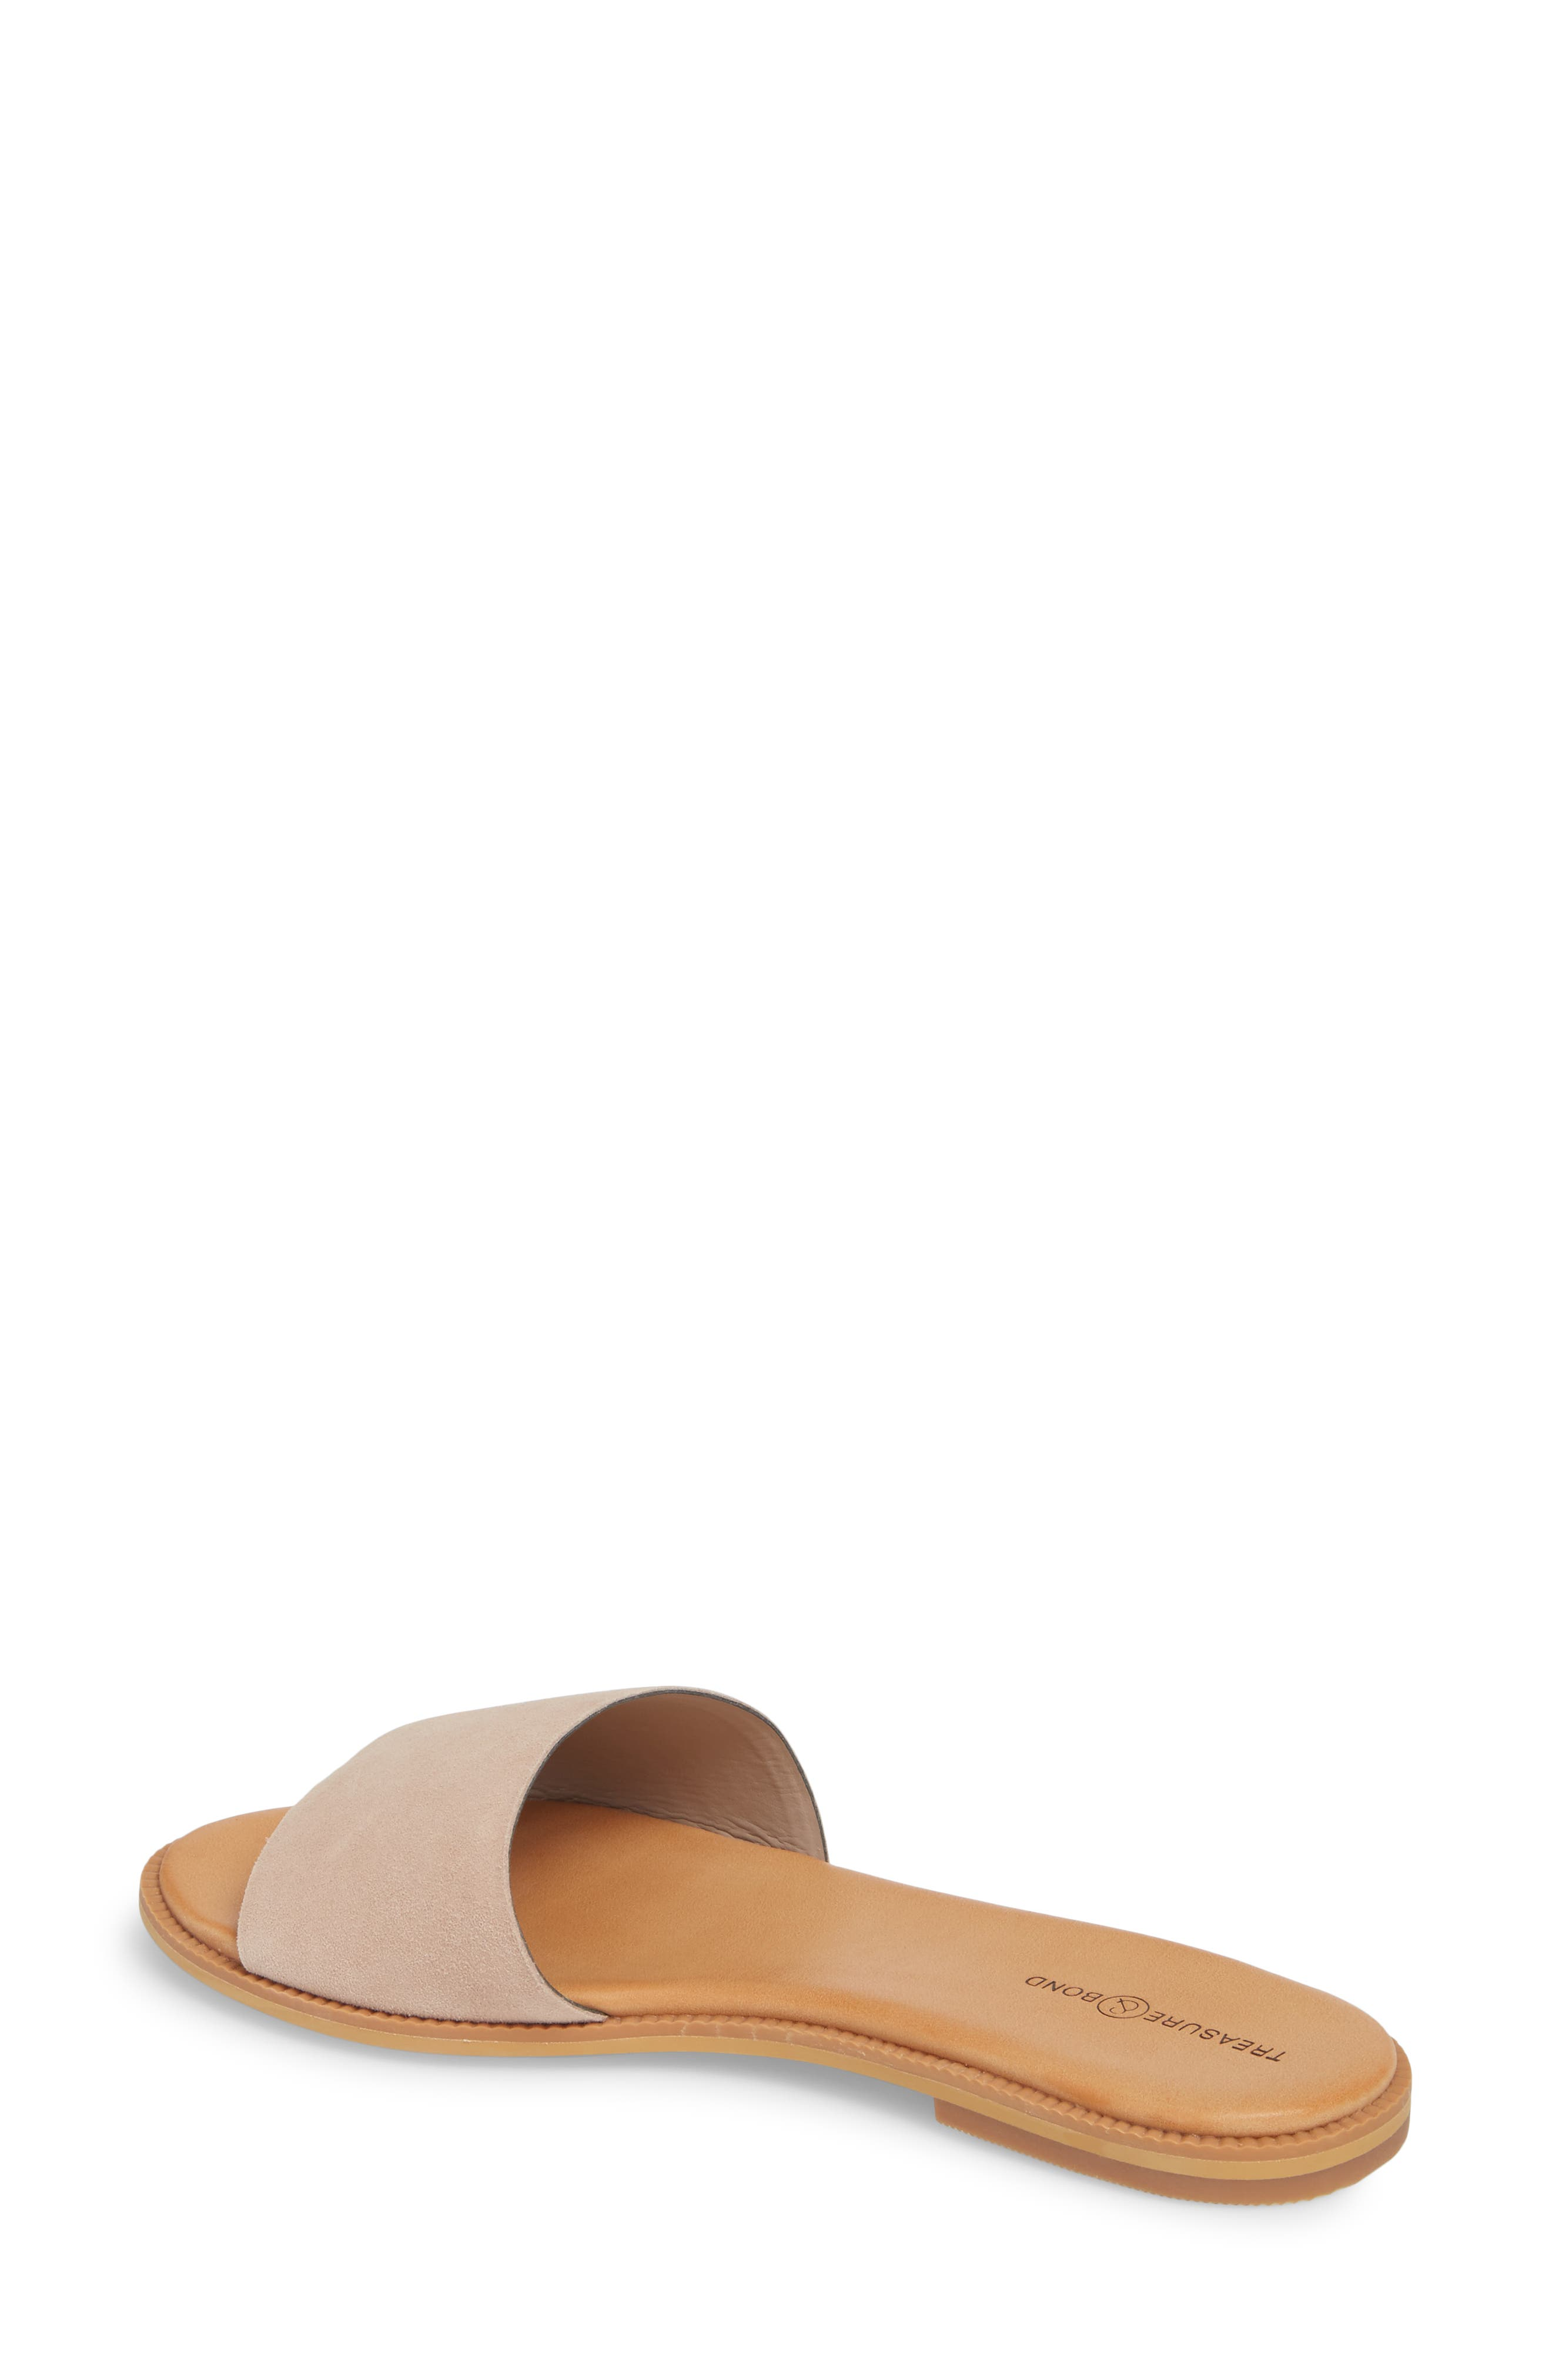 TREASURE & BOND, Mere Flat Slide Sandal, Alternate thumbnail 2, color, NEW BLUSH SUEDE